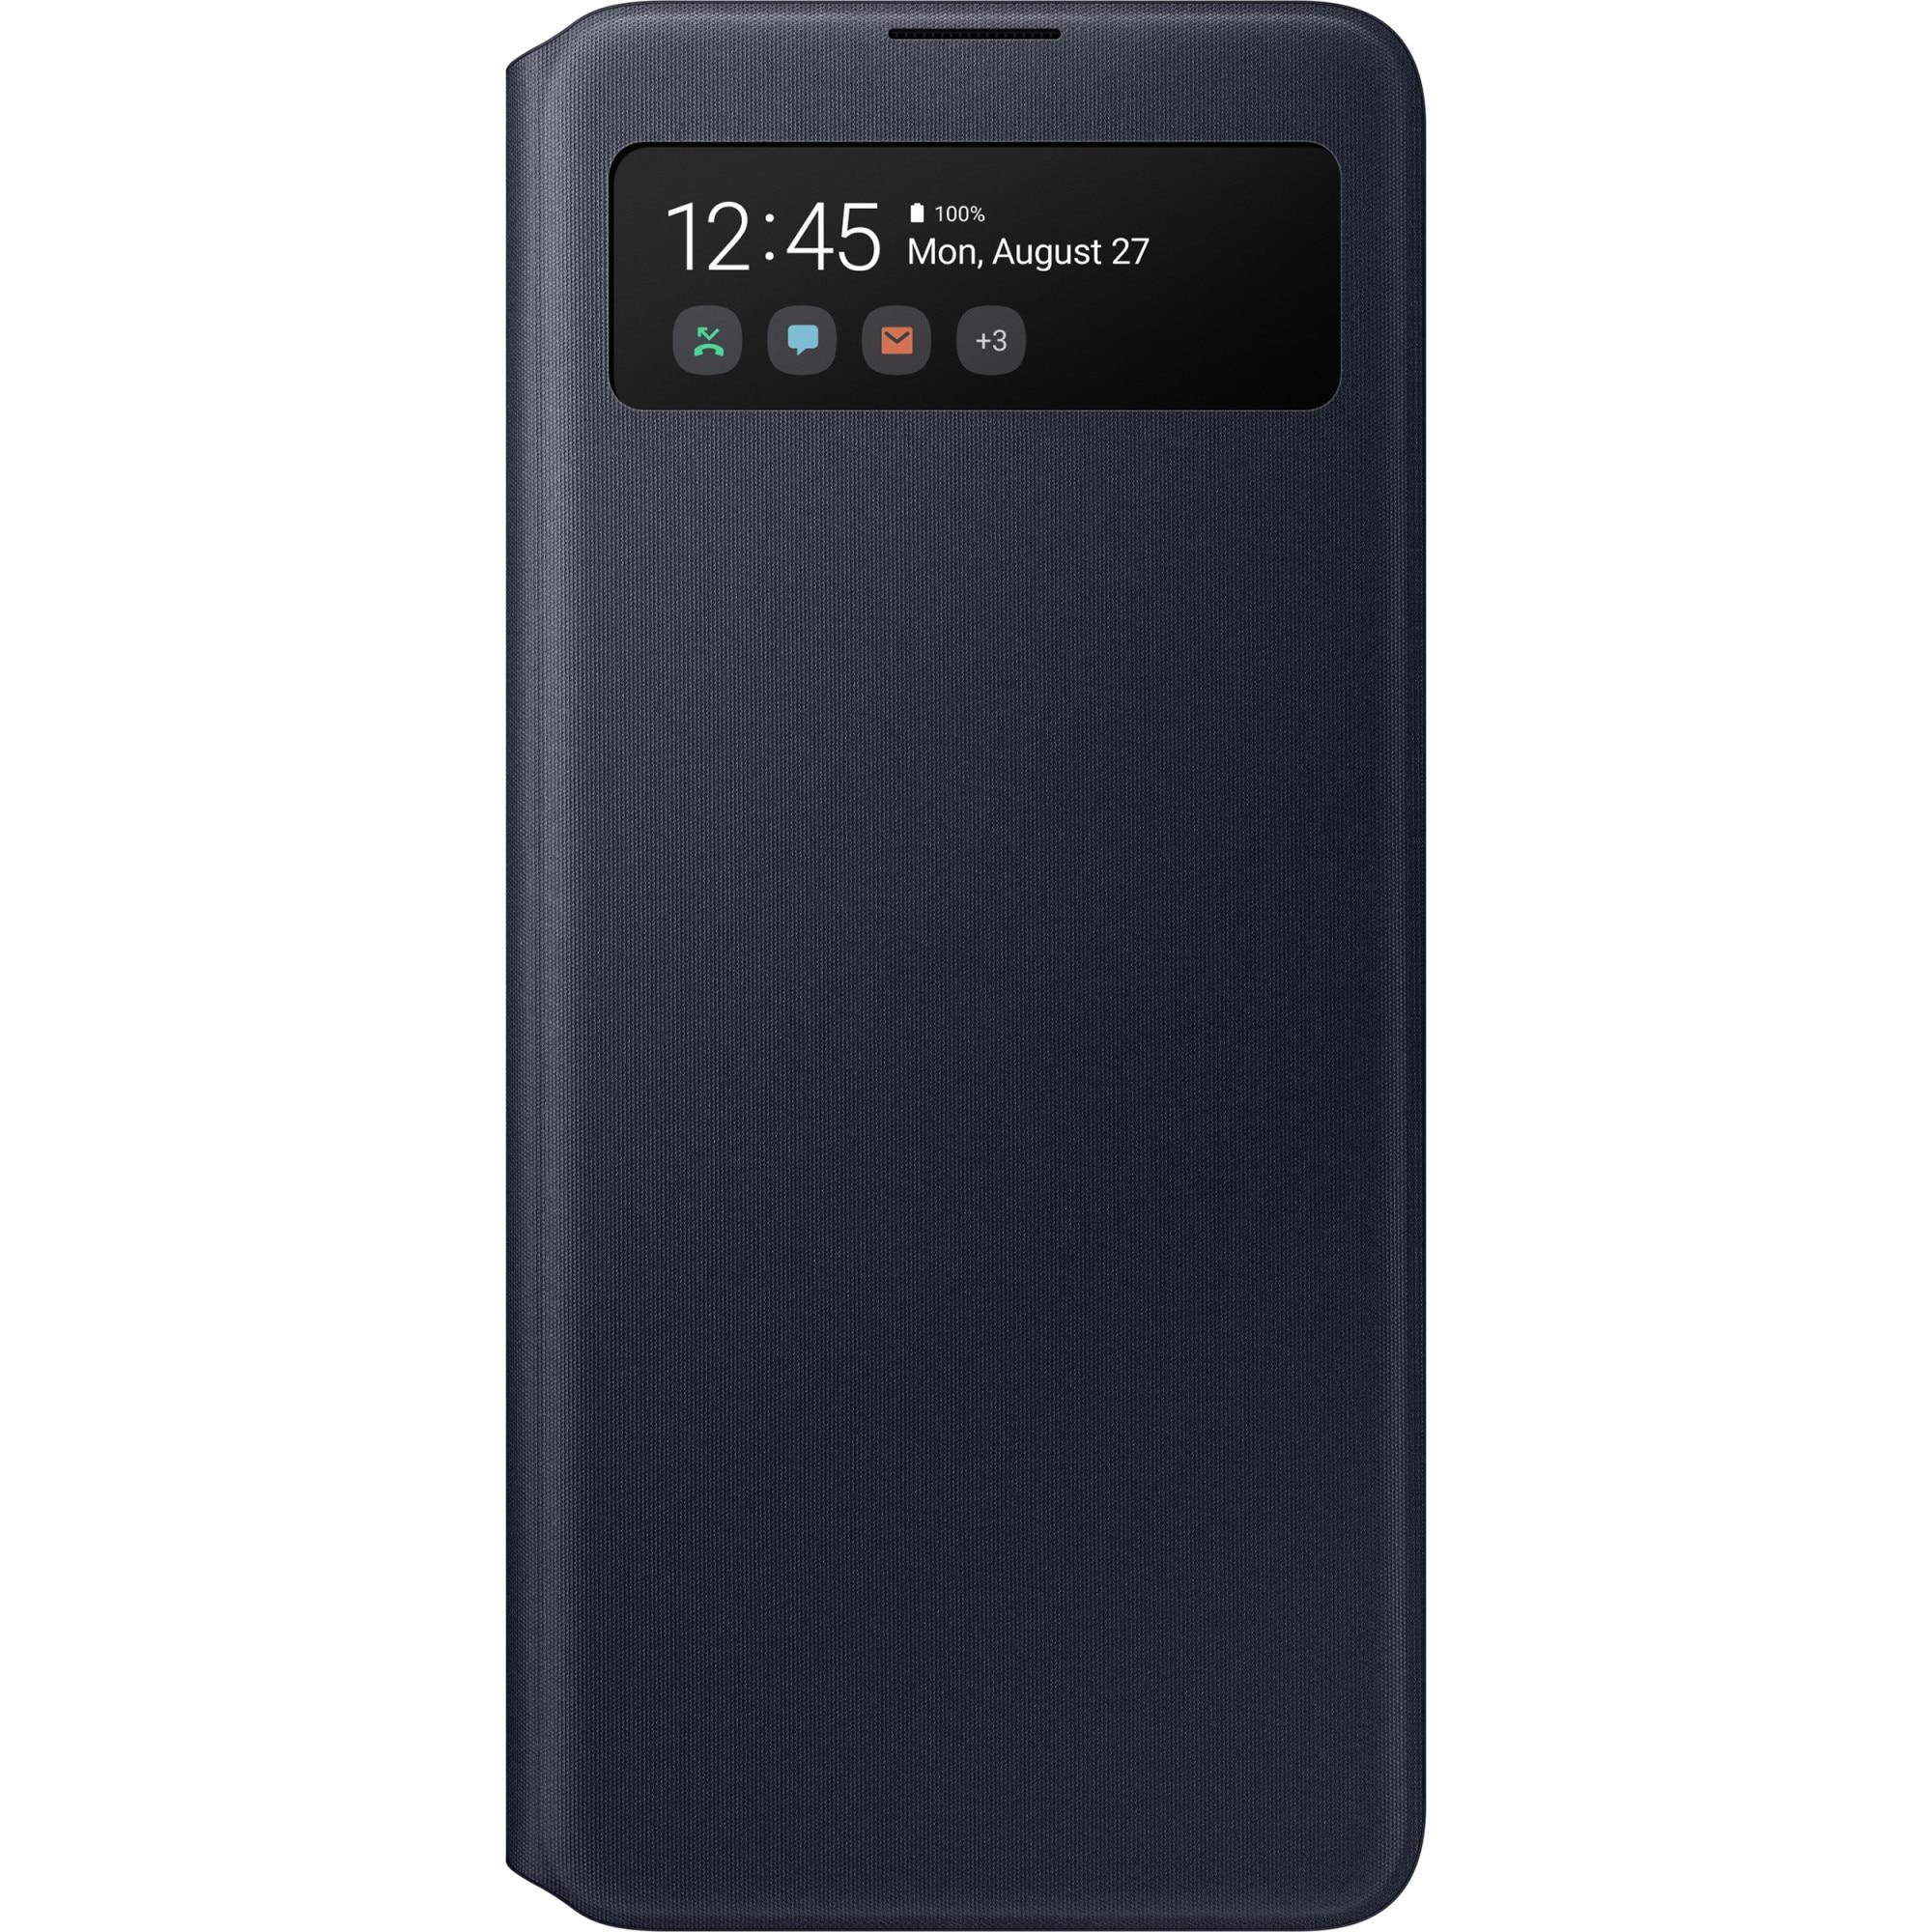 Fotografie Husa de protectie Samsung S View Wallet Cover pentru Galaxy A51, Black